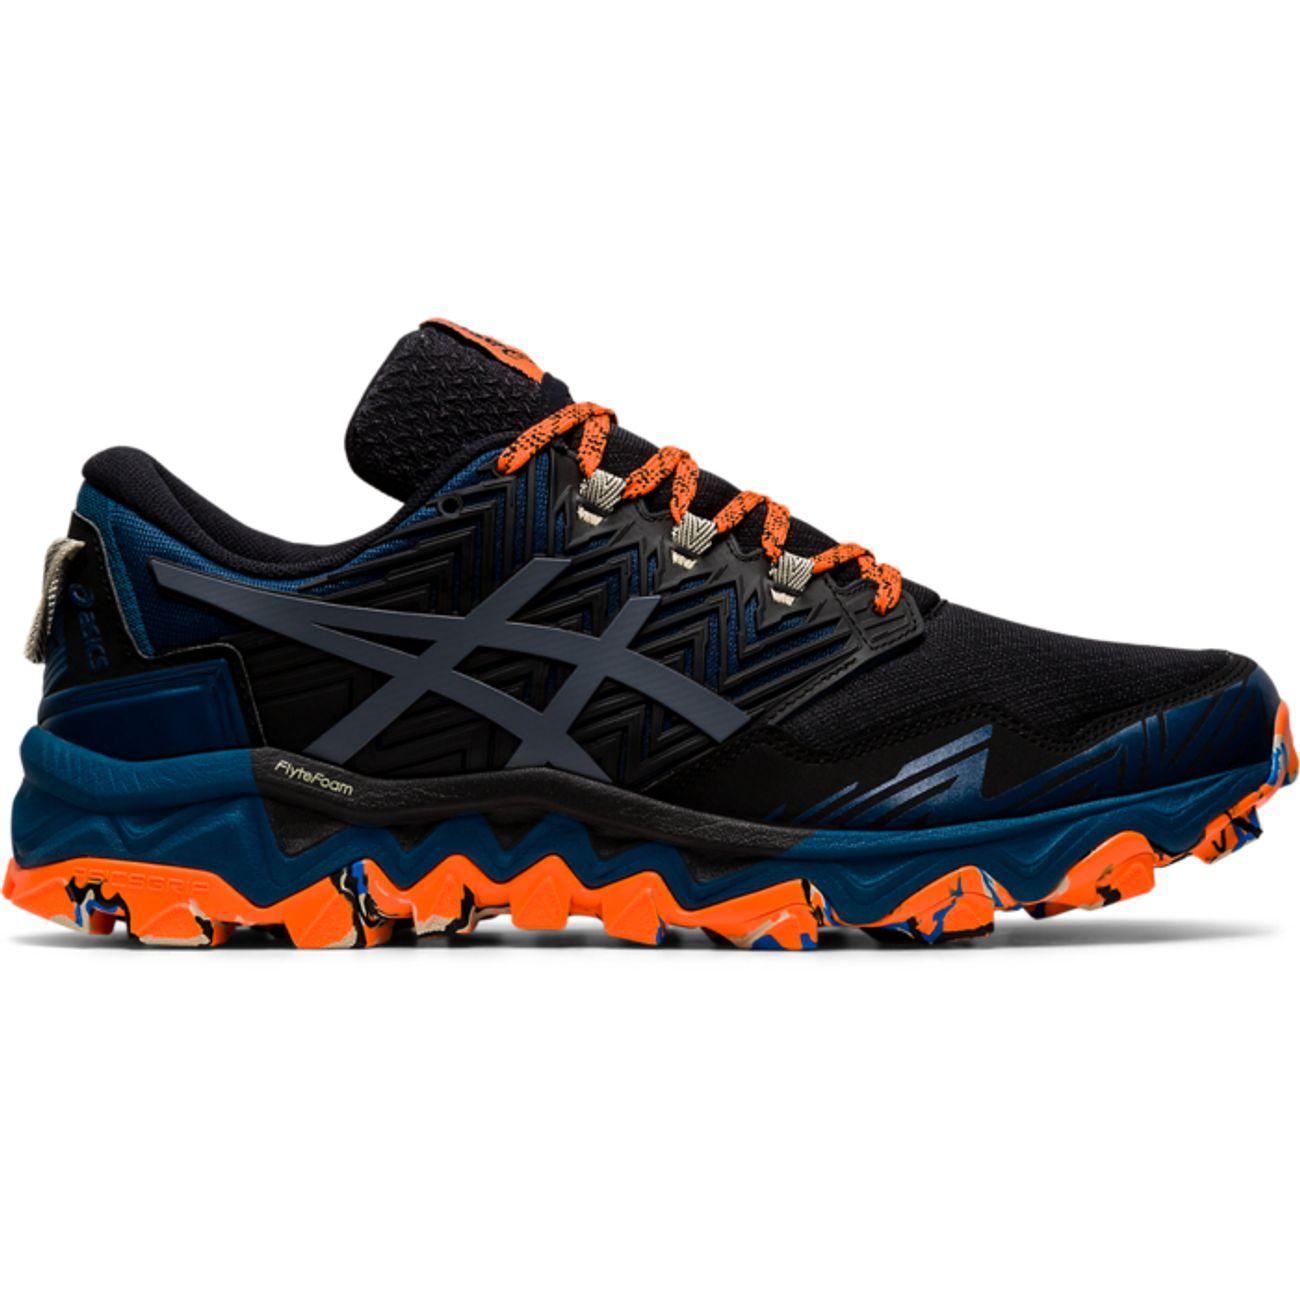 Chaussures de running Asics Gel-Fujitrabuco 8 pour Homme - Tailles 40.5 à 46